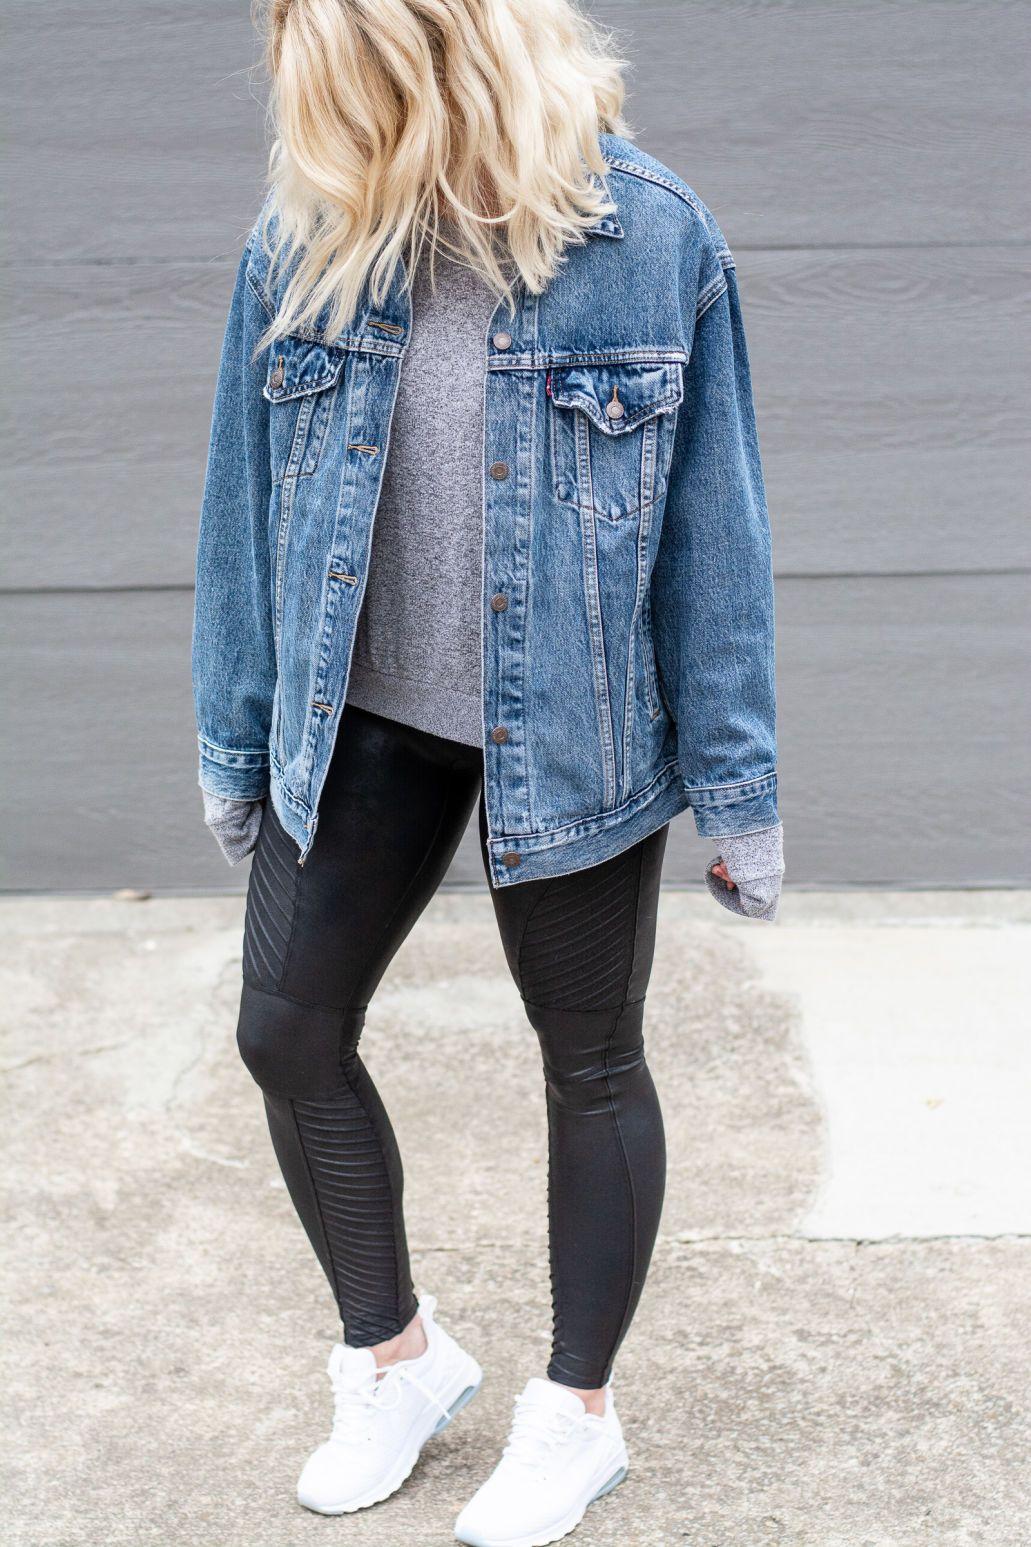 Oversized Jean Jacket Spanx Moto Leggings Lsr Oversized Jean Jacket Outfit Oversized Denim Jacket Outfit Oversized Jean Jacket [ 1547 x 1031 Pixel ]